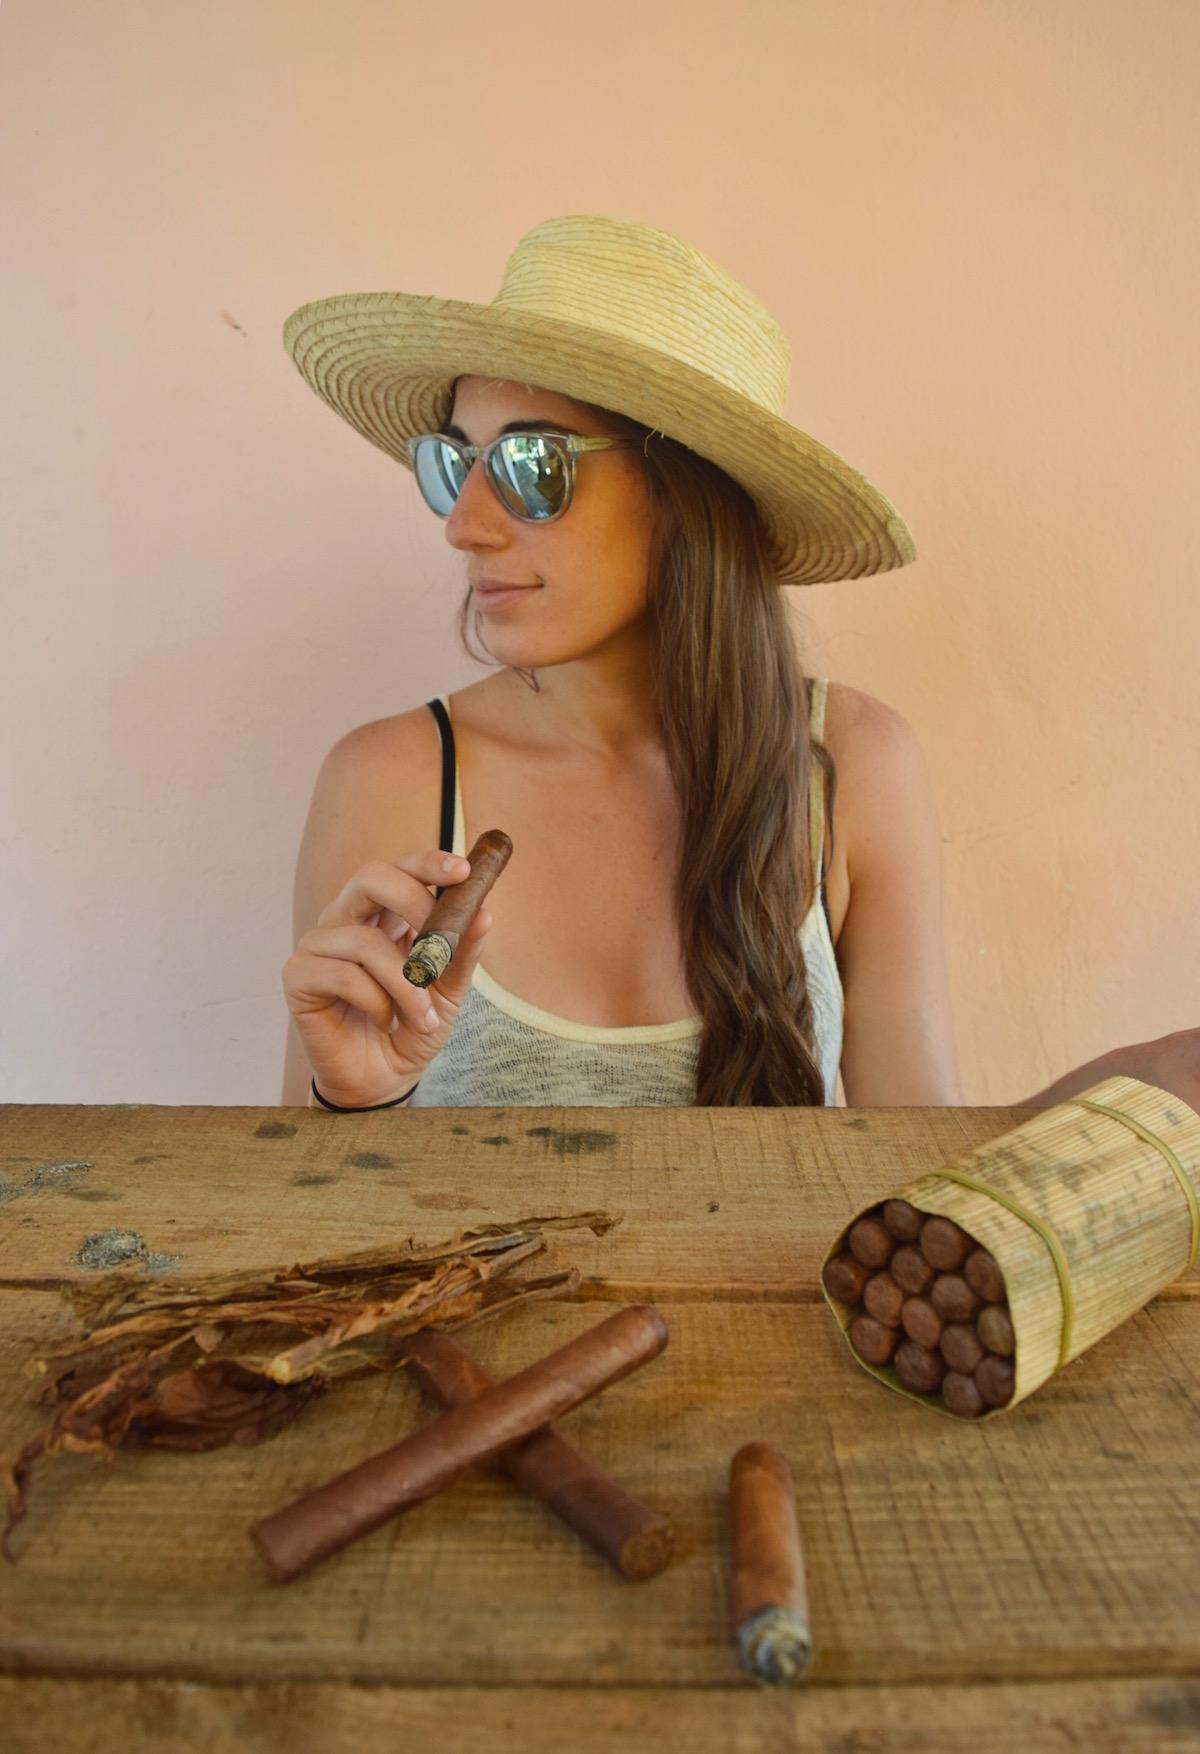 Get a tutorial while in Vinales on organicly farmed cuban cigars  -  Tessa Juliette | http://travelwheretonext.com/cuba